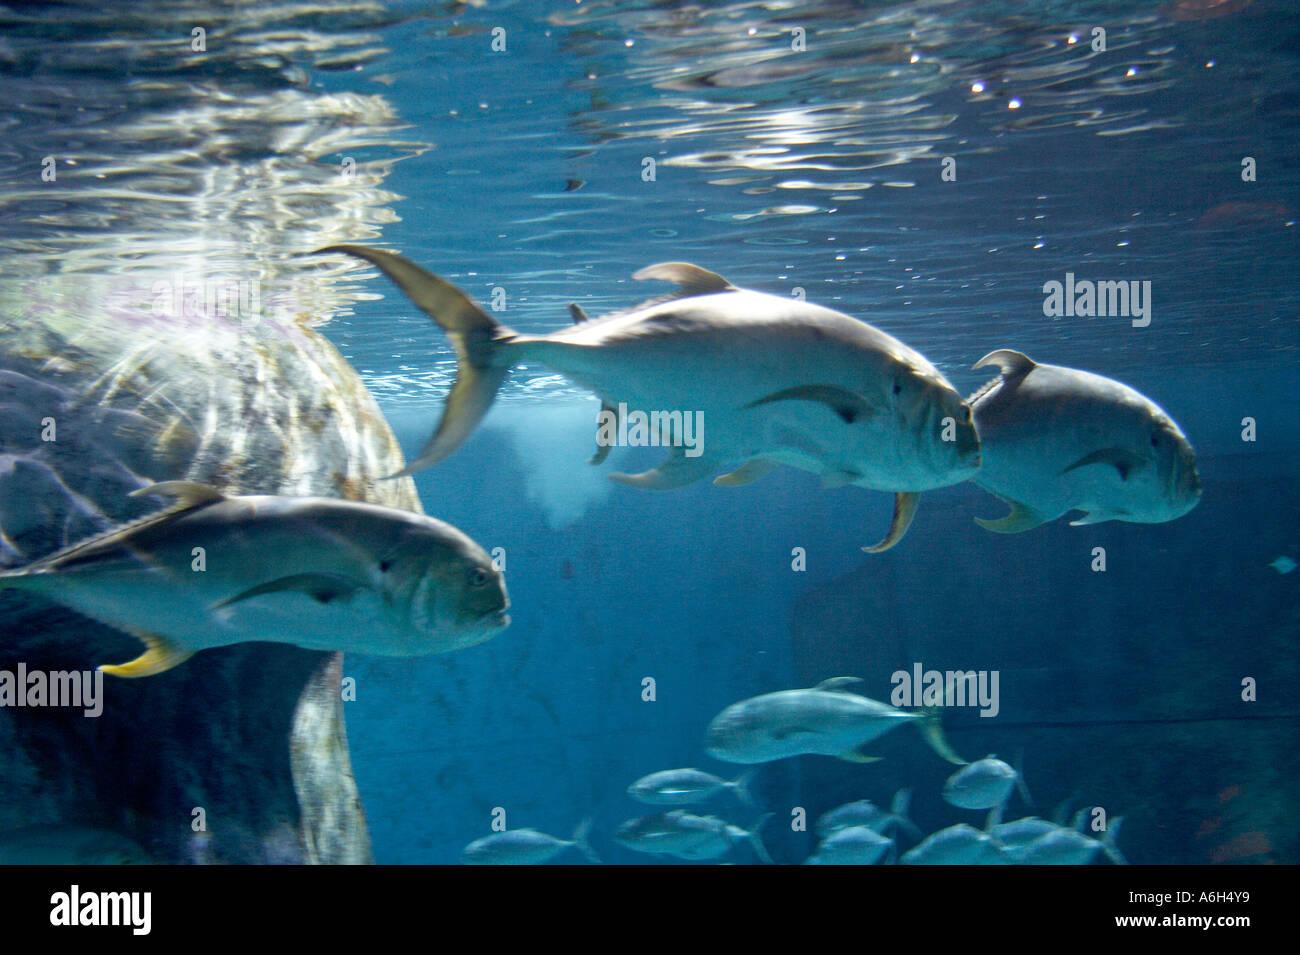 Buy fish for aquarium london - Giant Trevally Caranx Ignobilis Fish Swimming In Tank In London Aquarium London Se1 England Uk